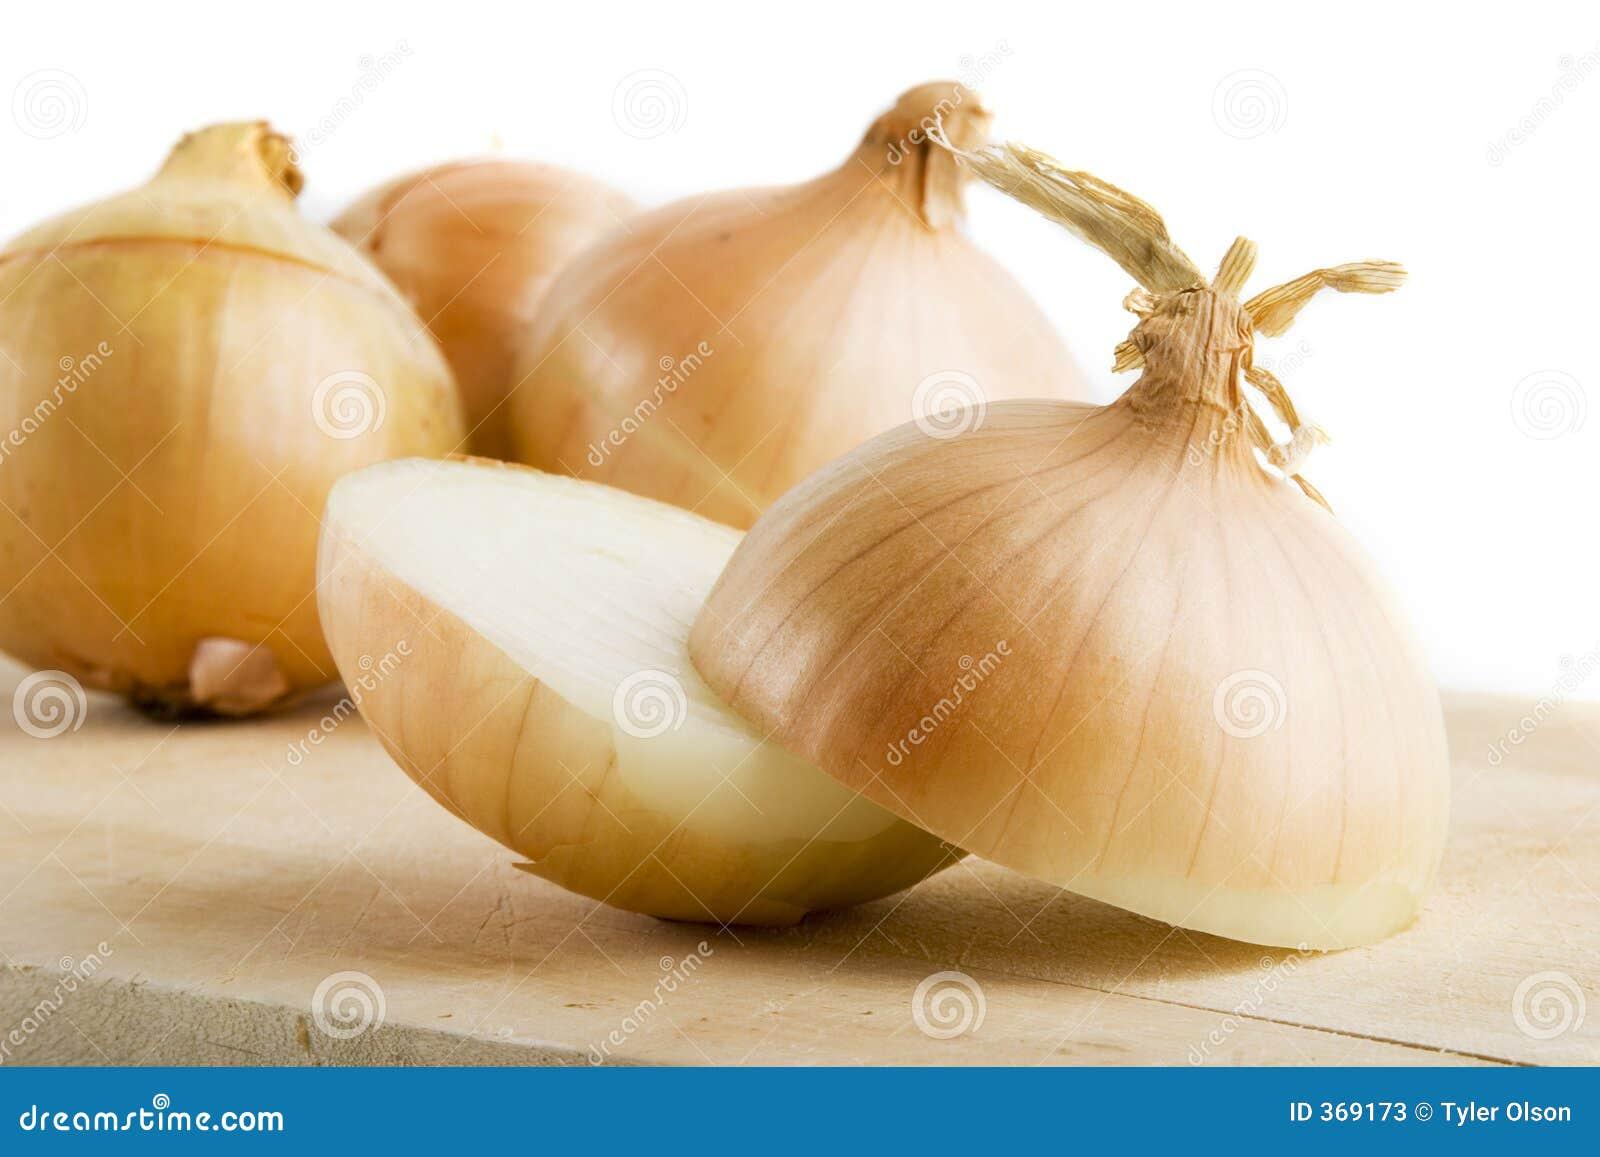 Onion Group